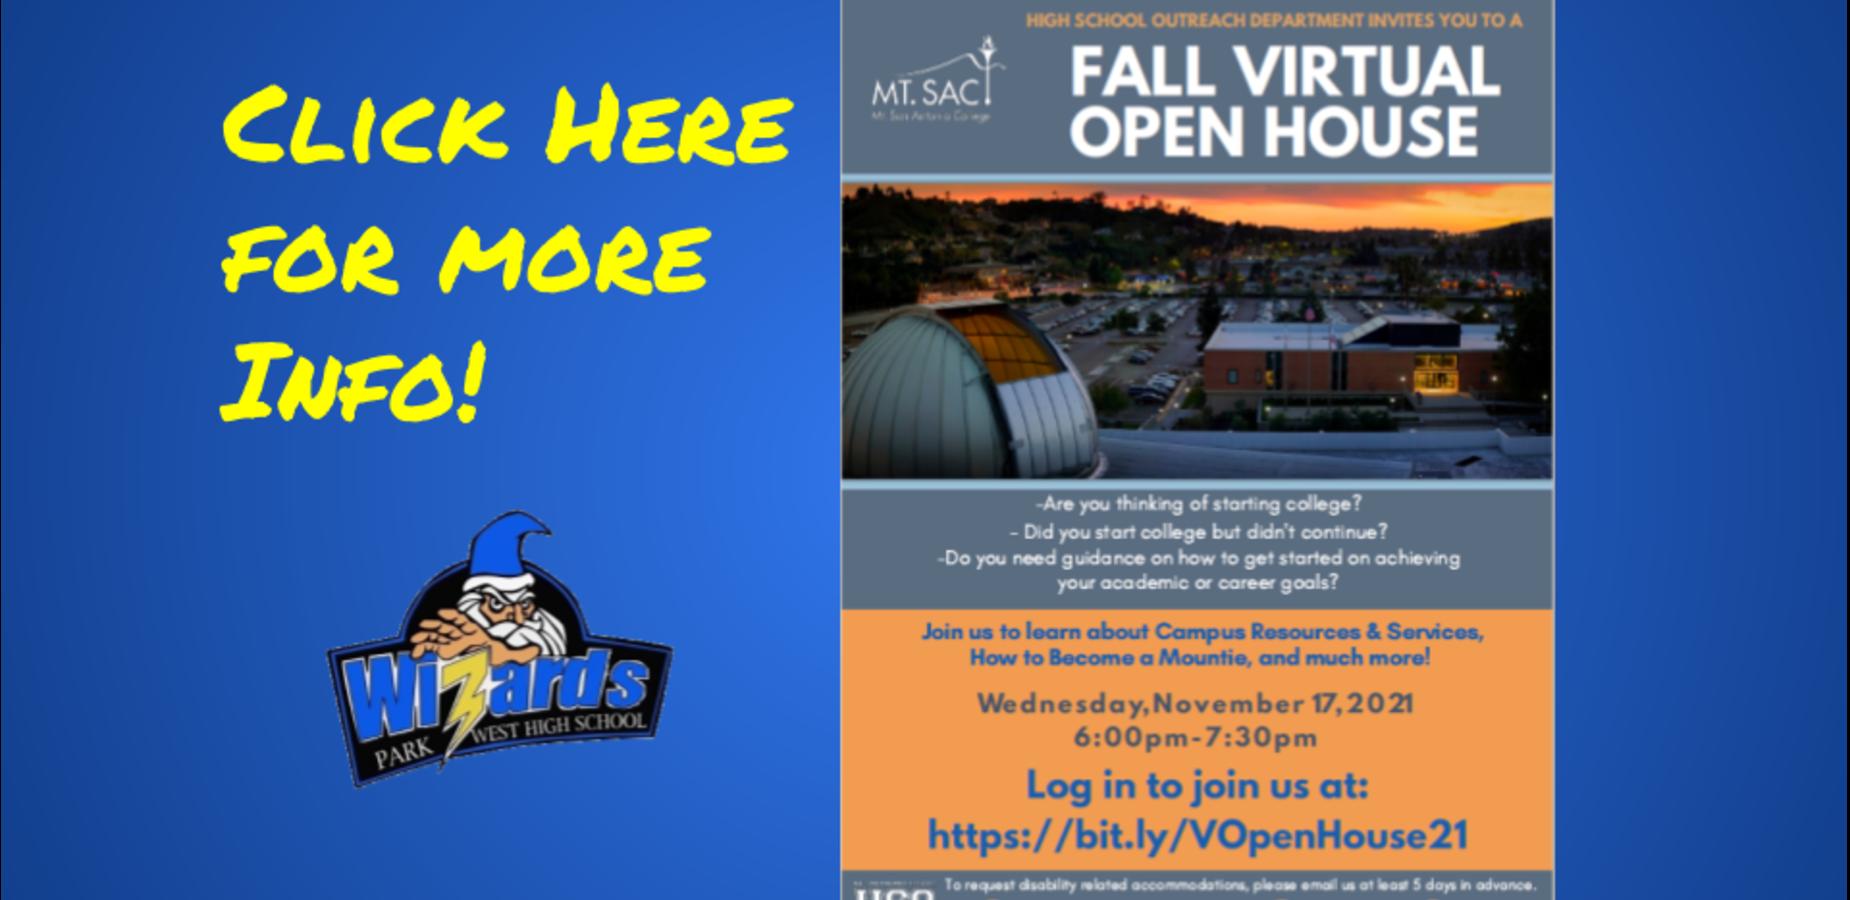 Fall Virtual Open House